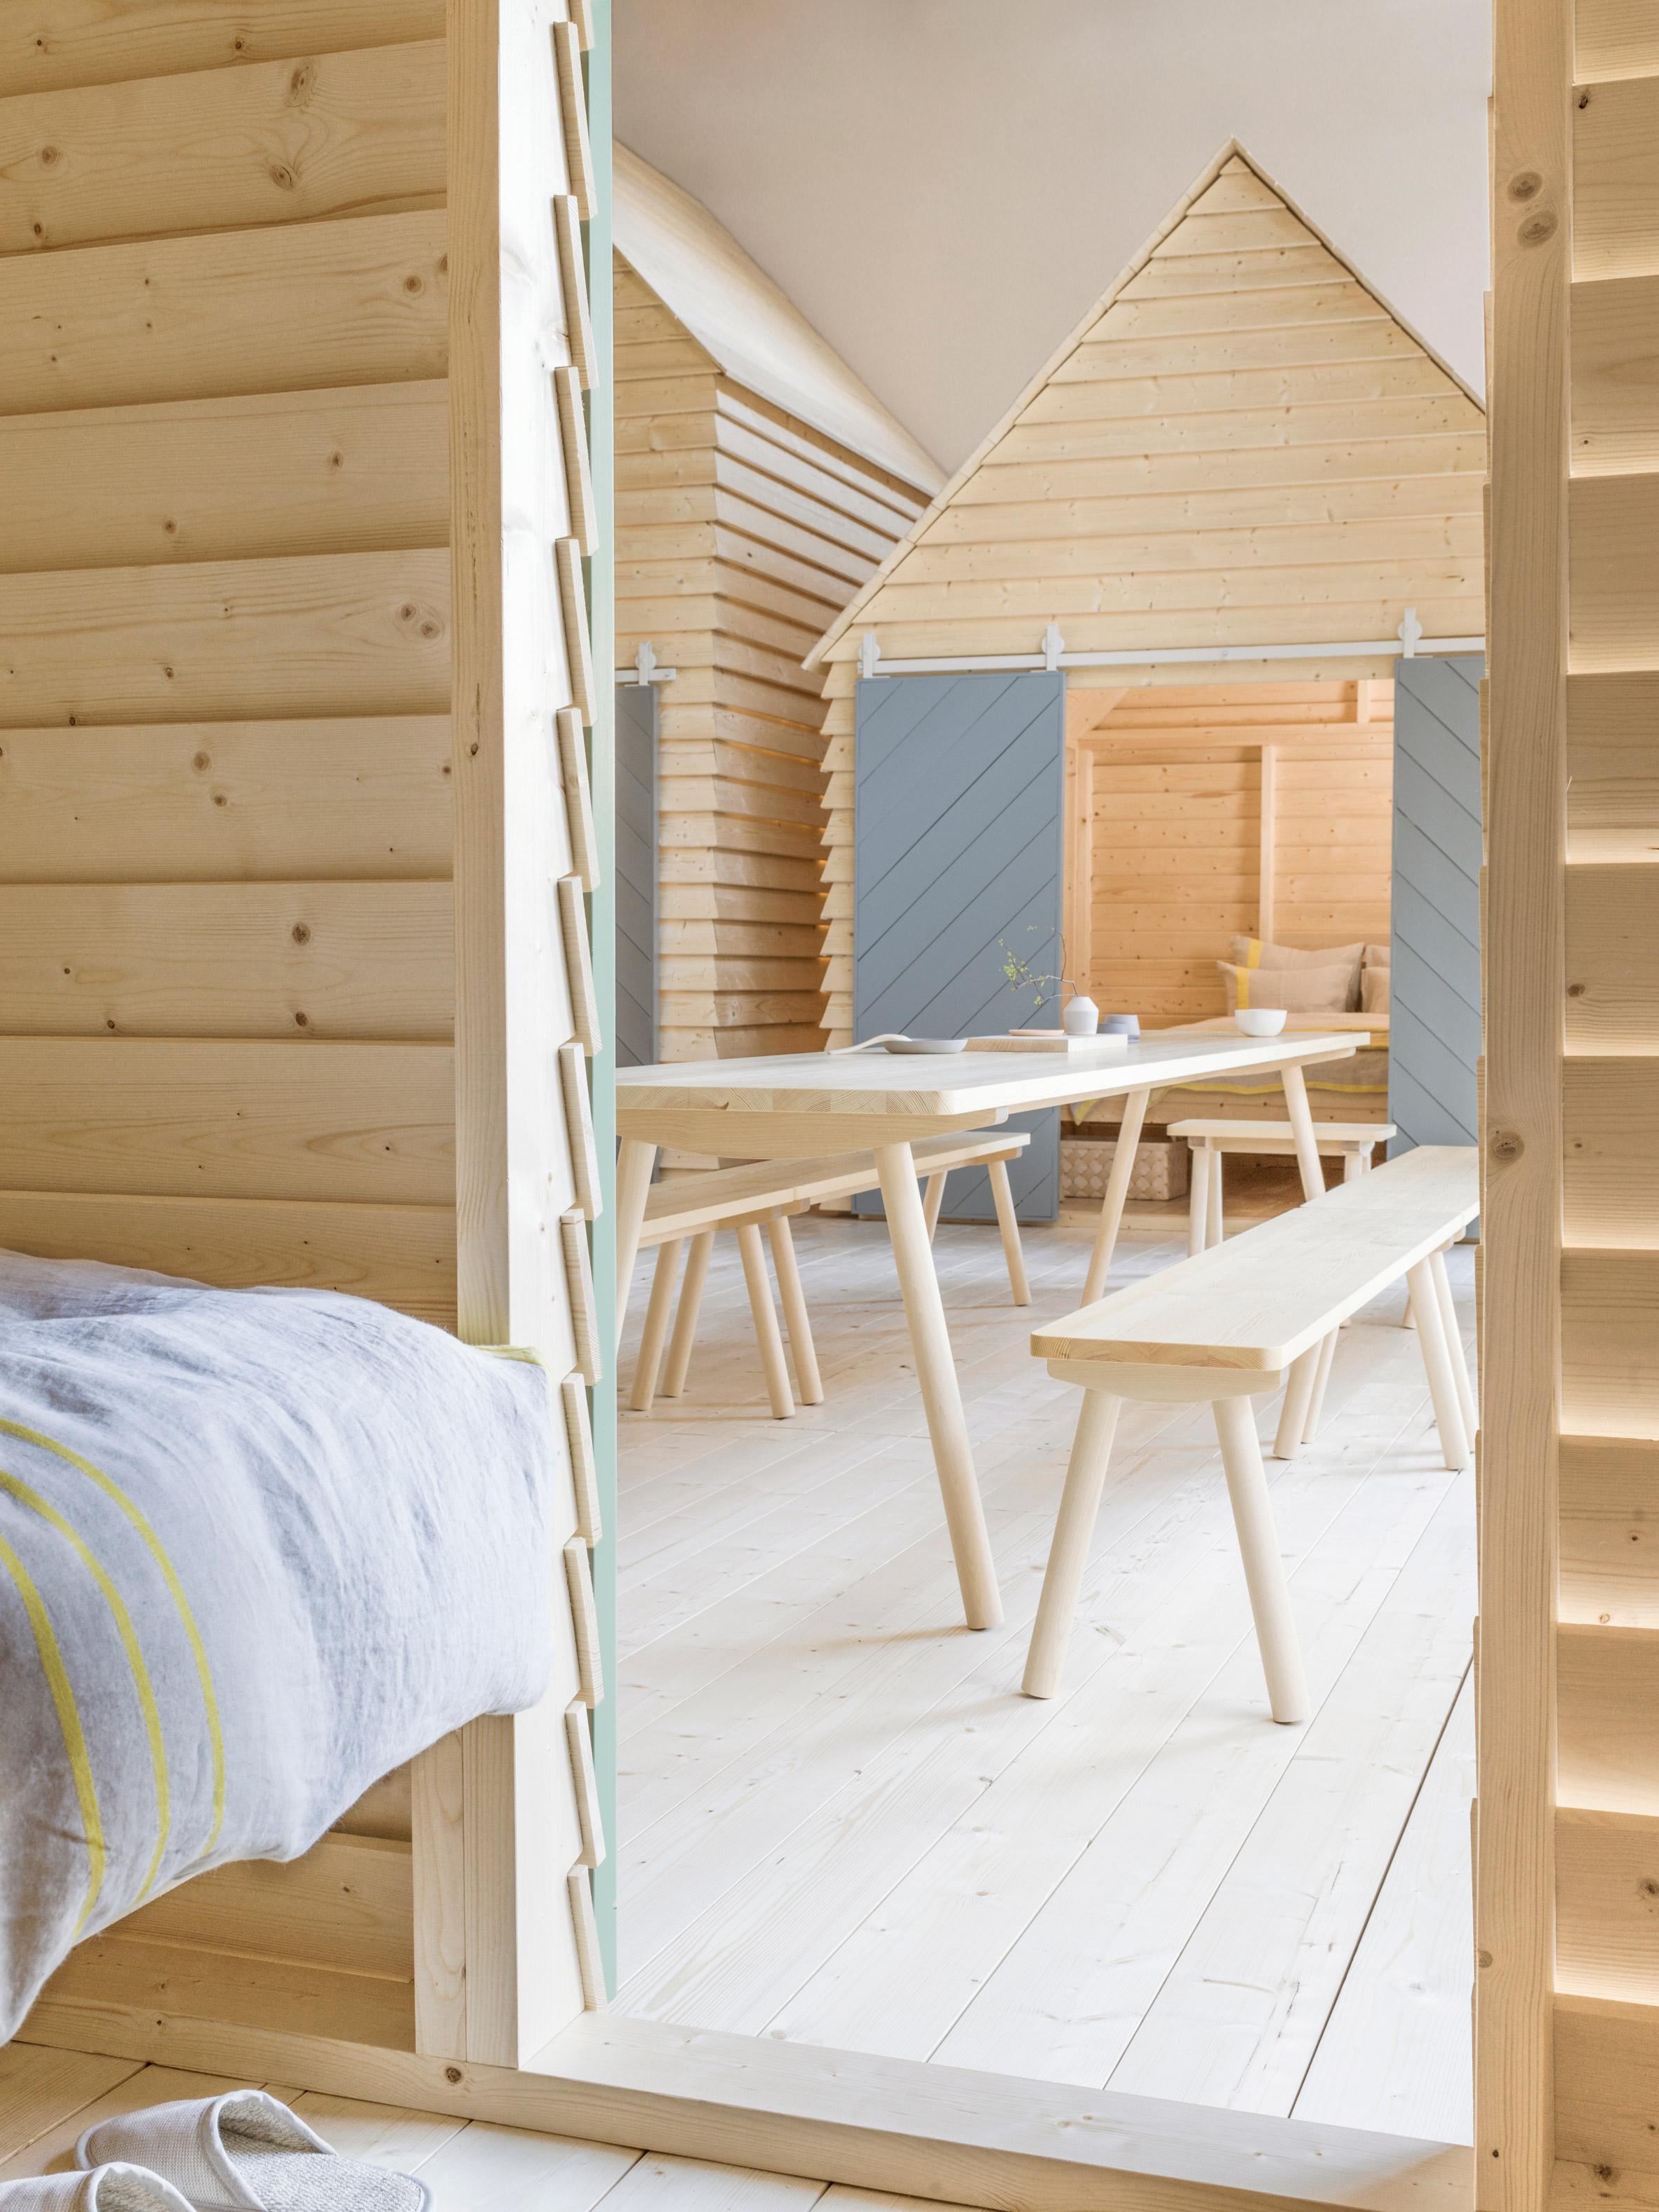 koti-popup-hotel-interiors-paris_dezeen_2364_col_3